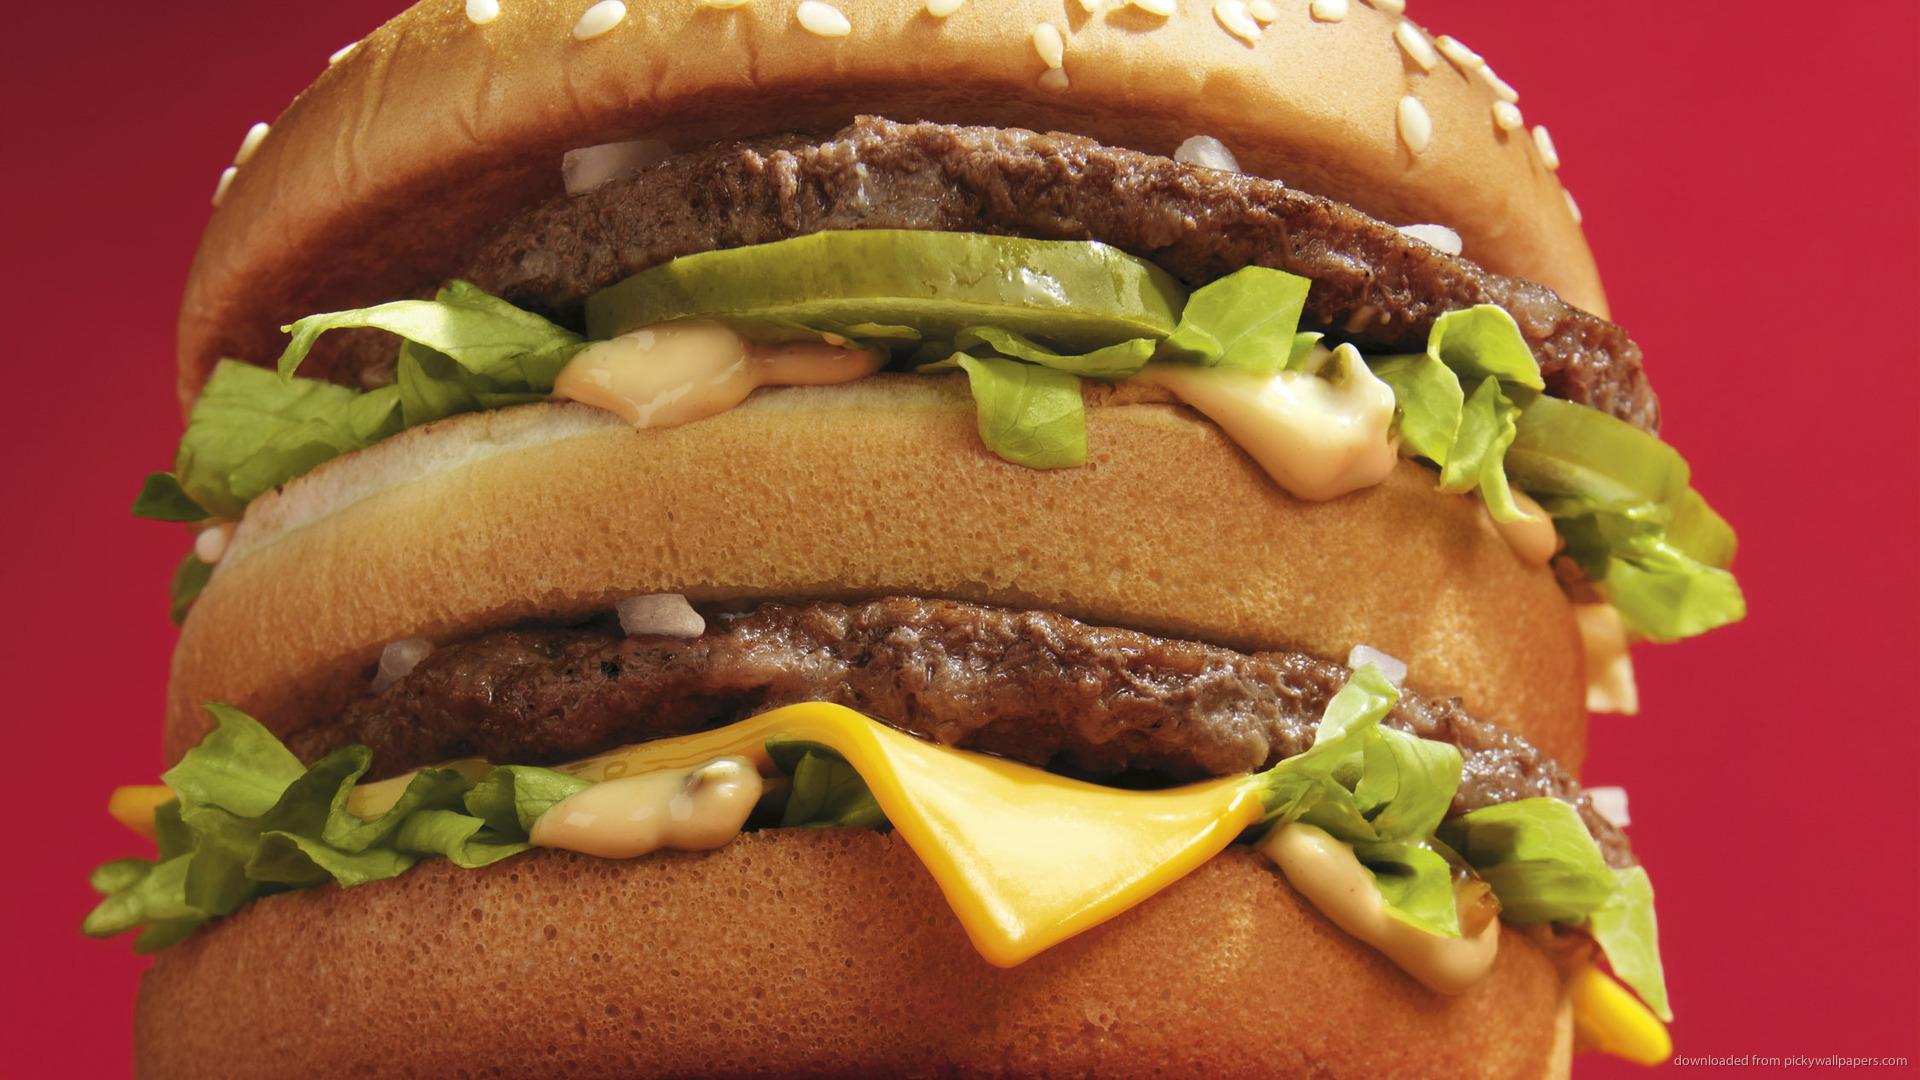 Mcdonalds food wallpaper wallpapers high quality - Fast good cuisine big mac ...